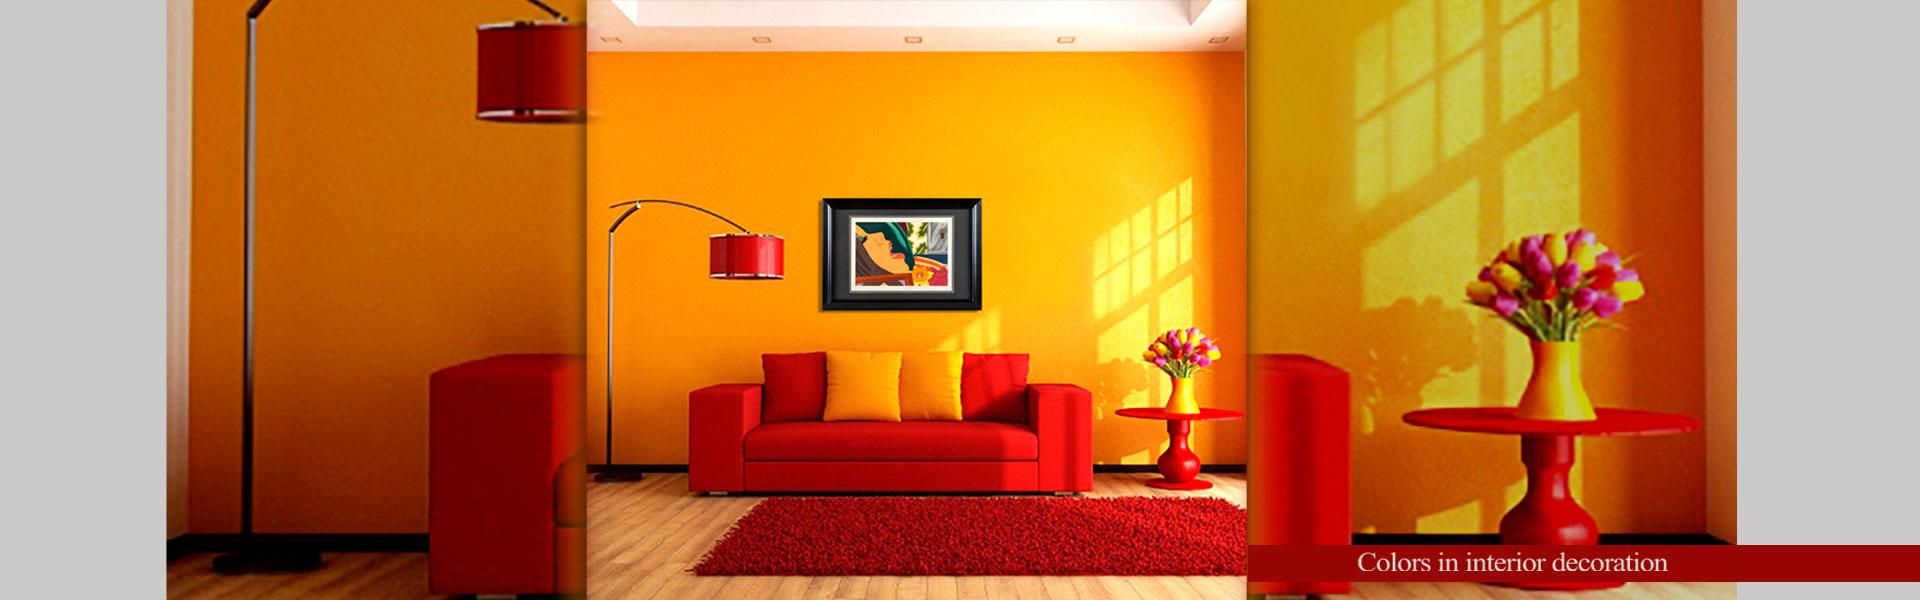 design 777a - رنگ های جلوه بخش در دکوراسیون